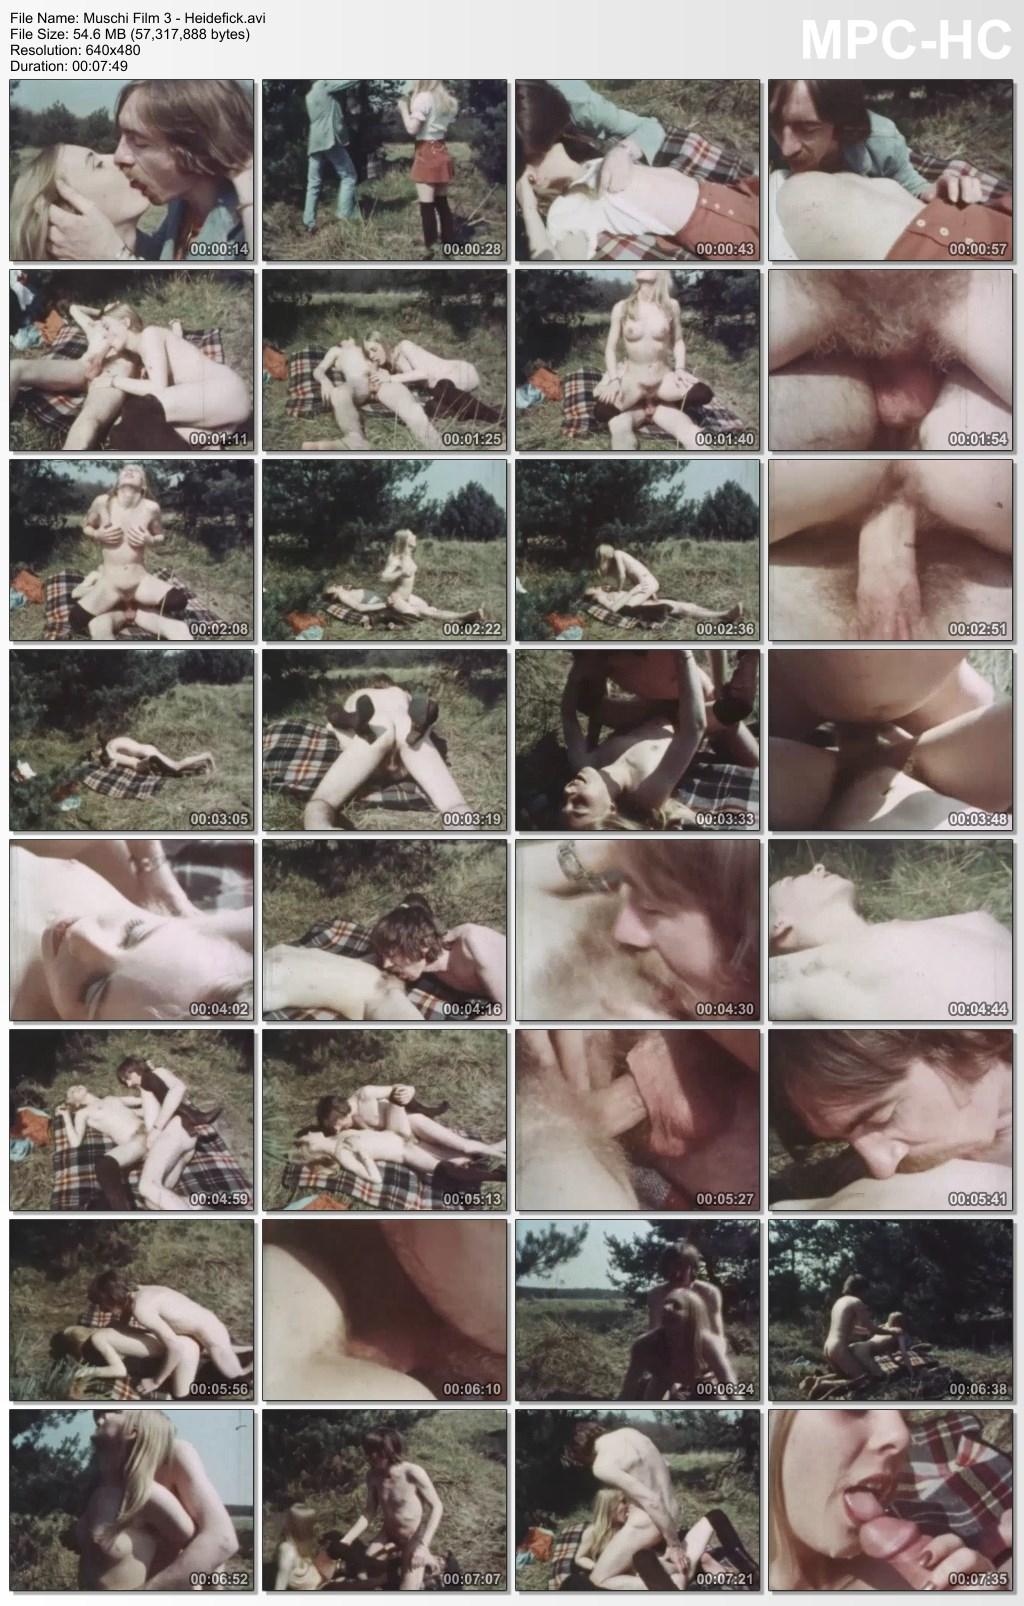 Muschi Film